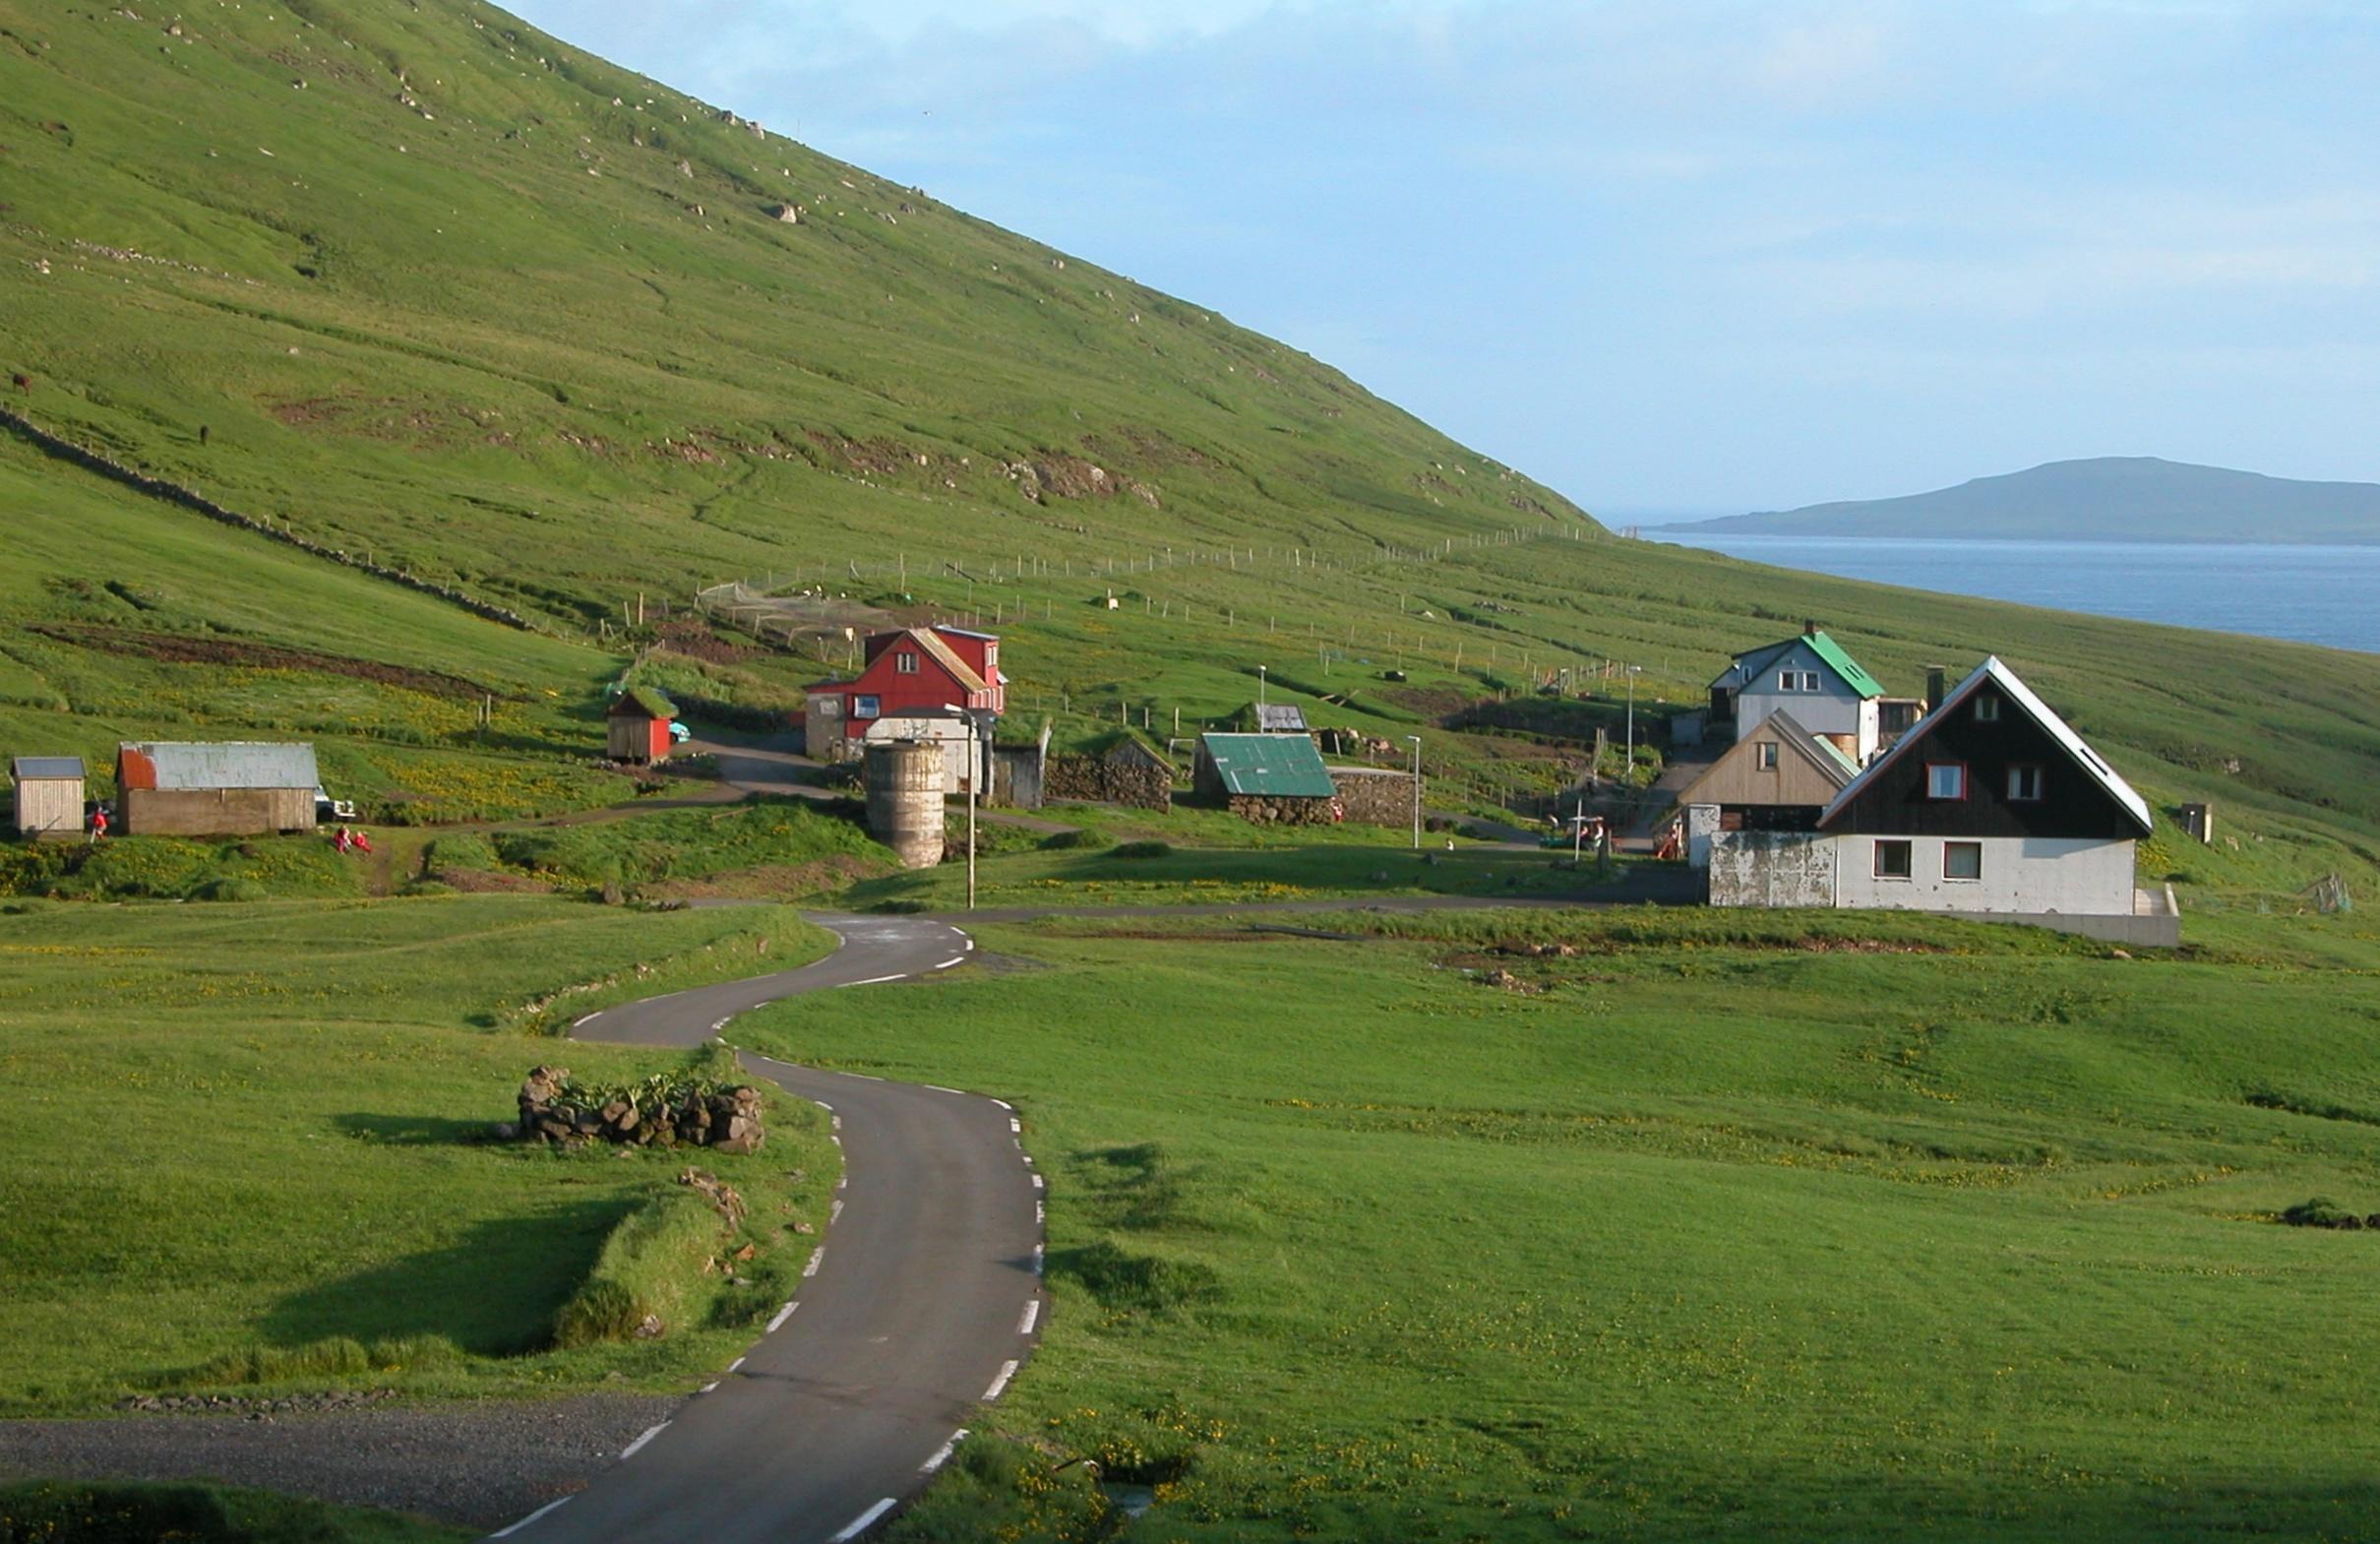 File:Norðradalur, Faroe Islands.JPG - Wikimedia Commons